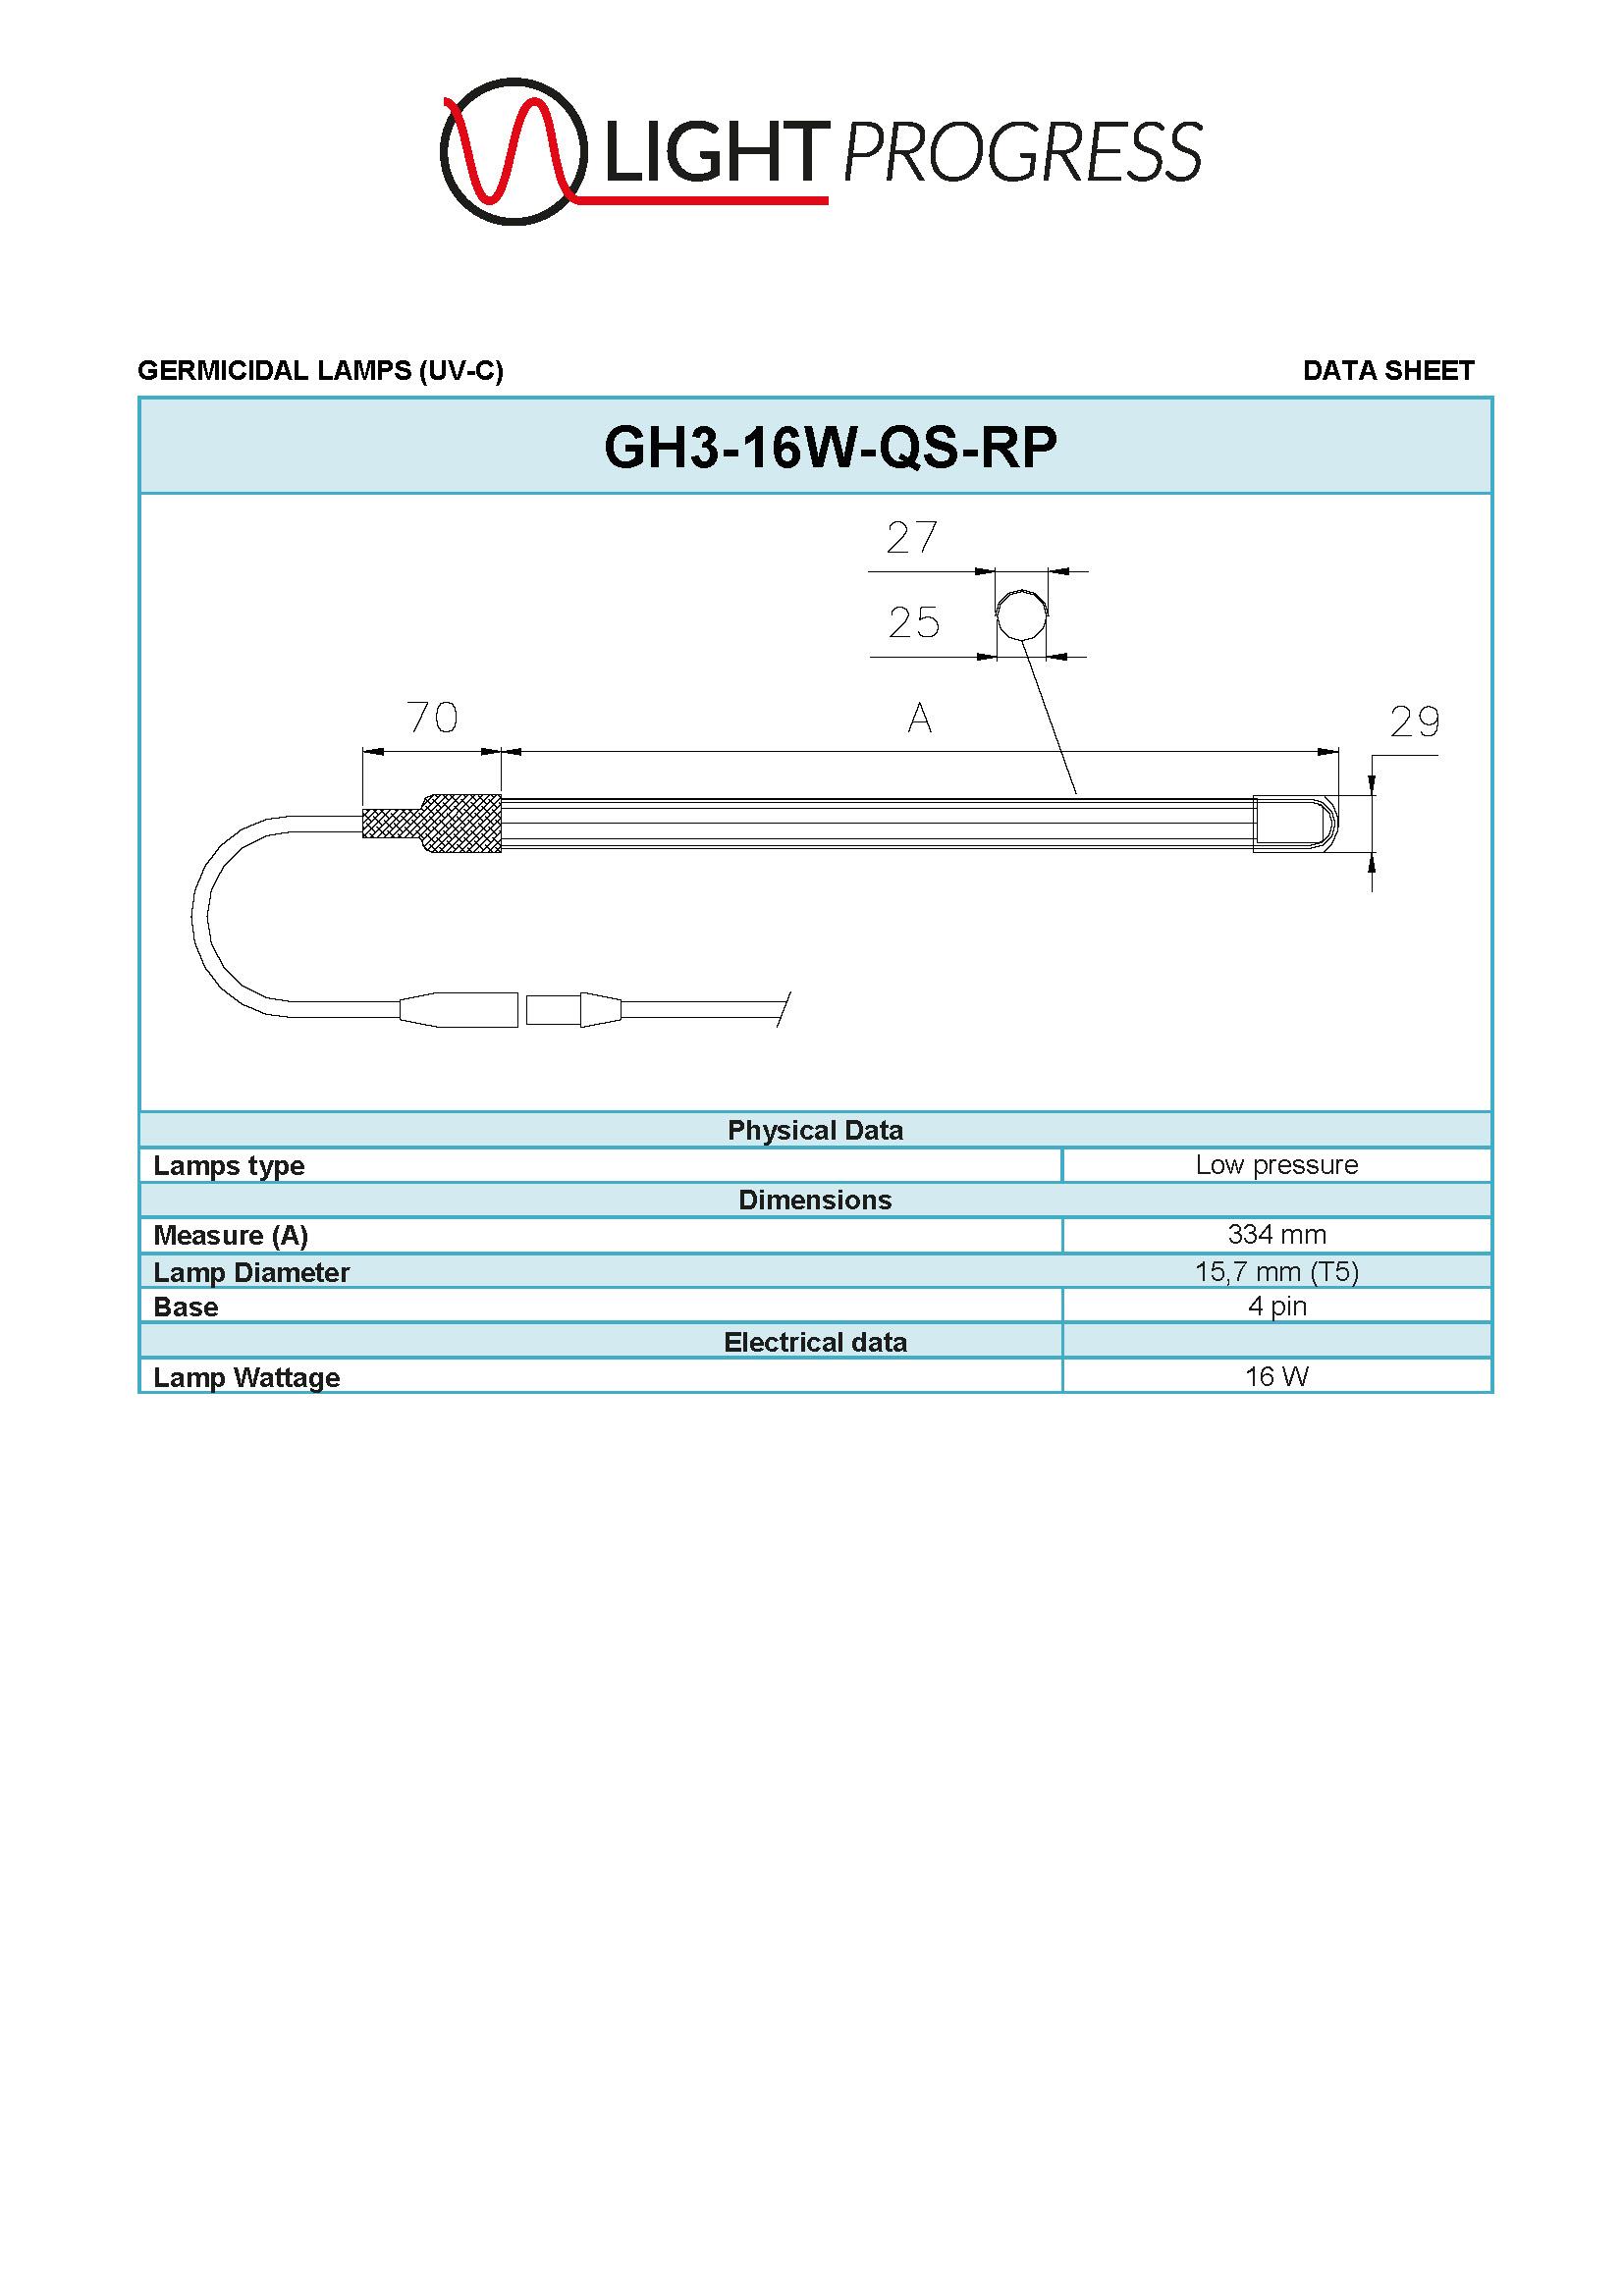 LIGHT PROGRESS GH3-16W